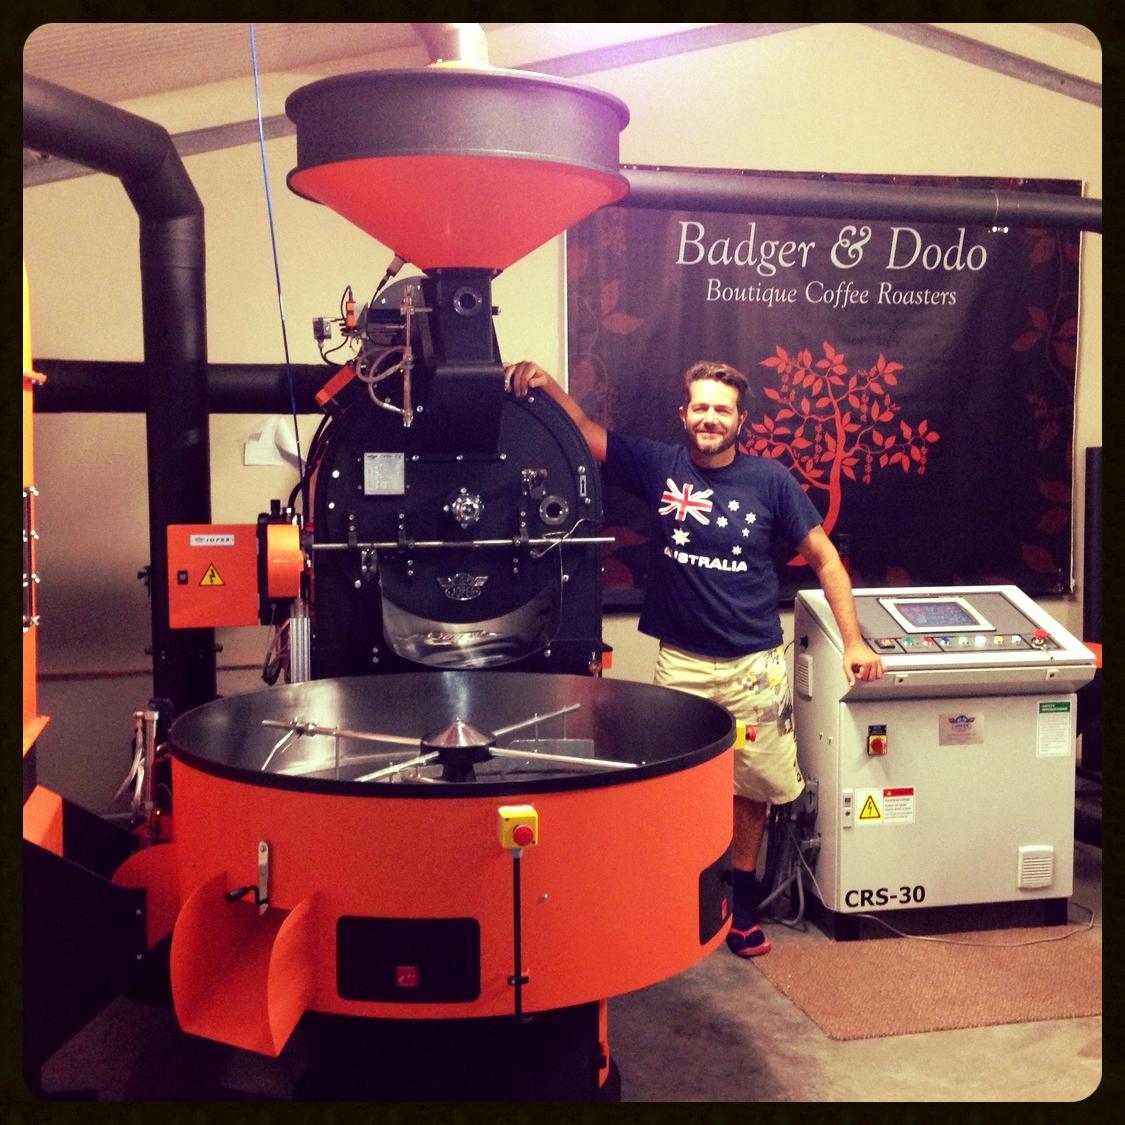 Brock Lewin, Owner of Badger & Dodo Boutique Coffee Roasters.